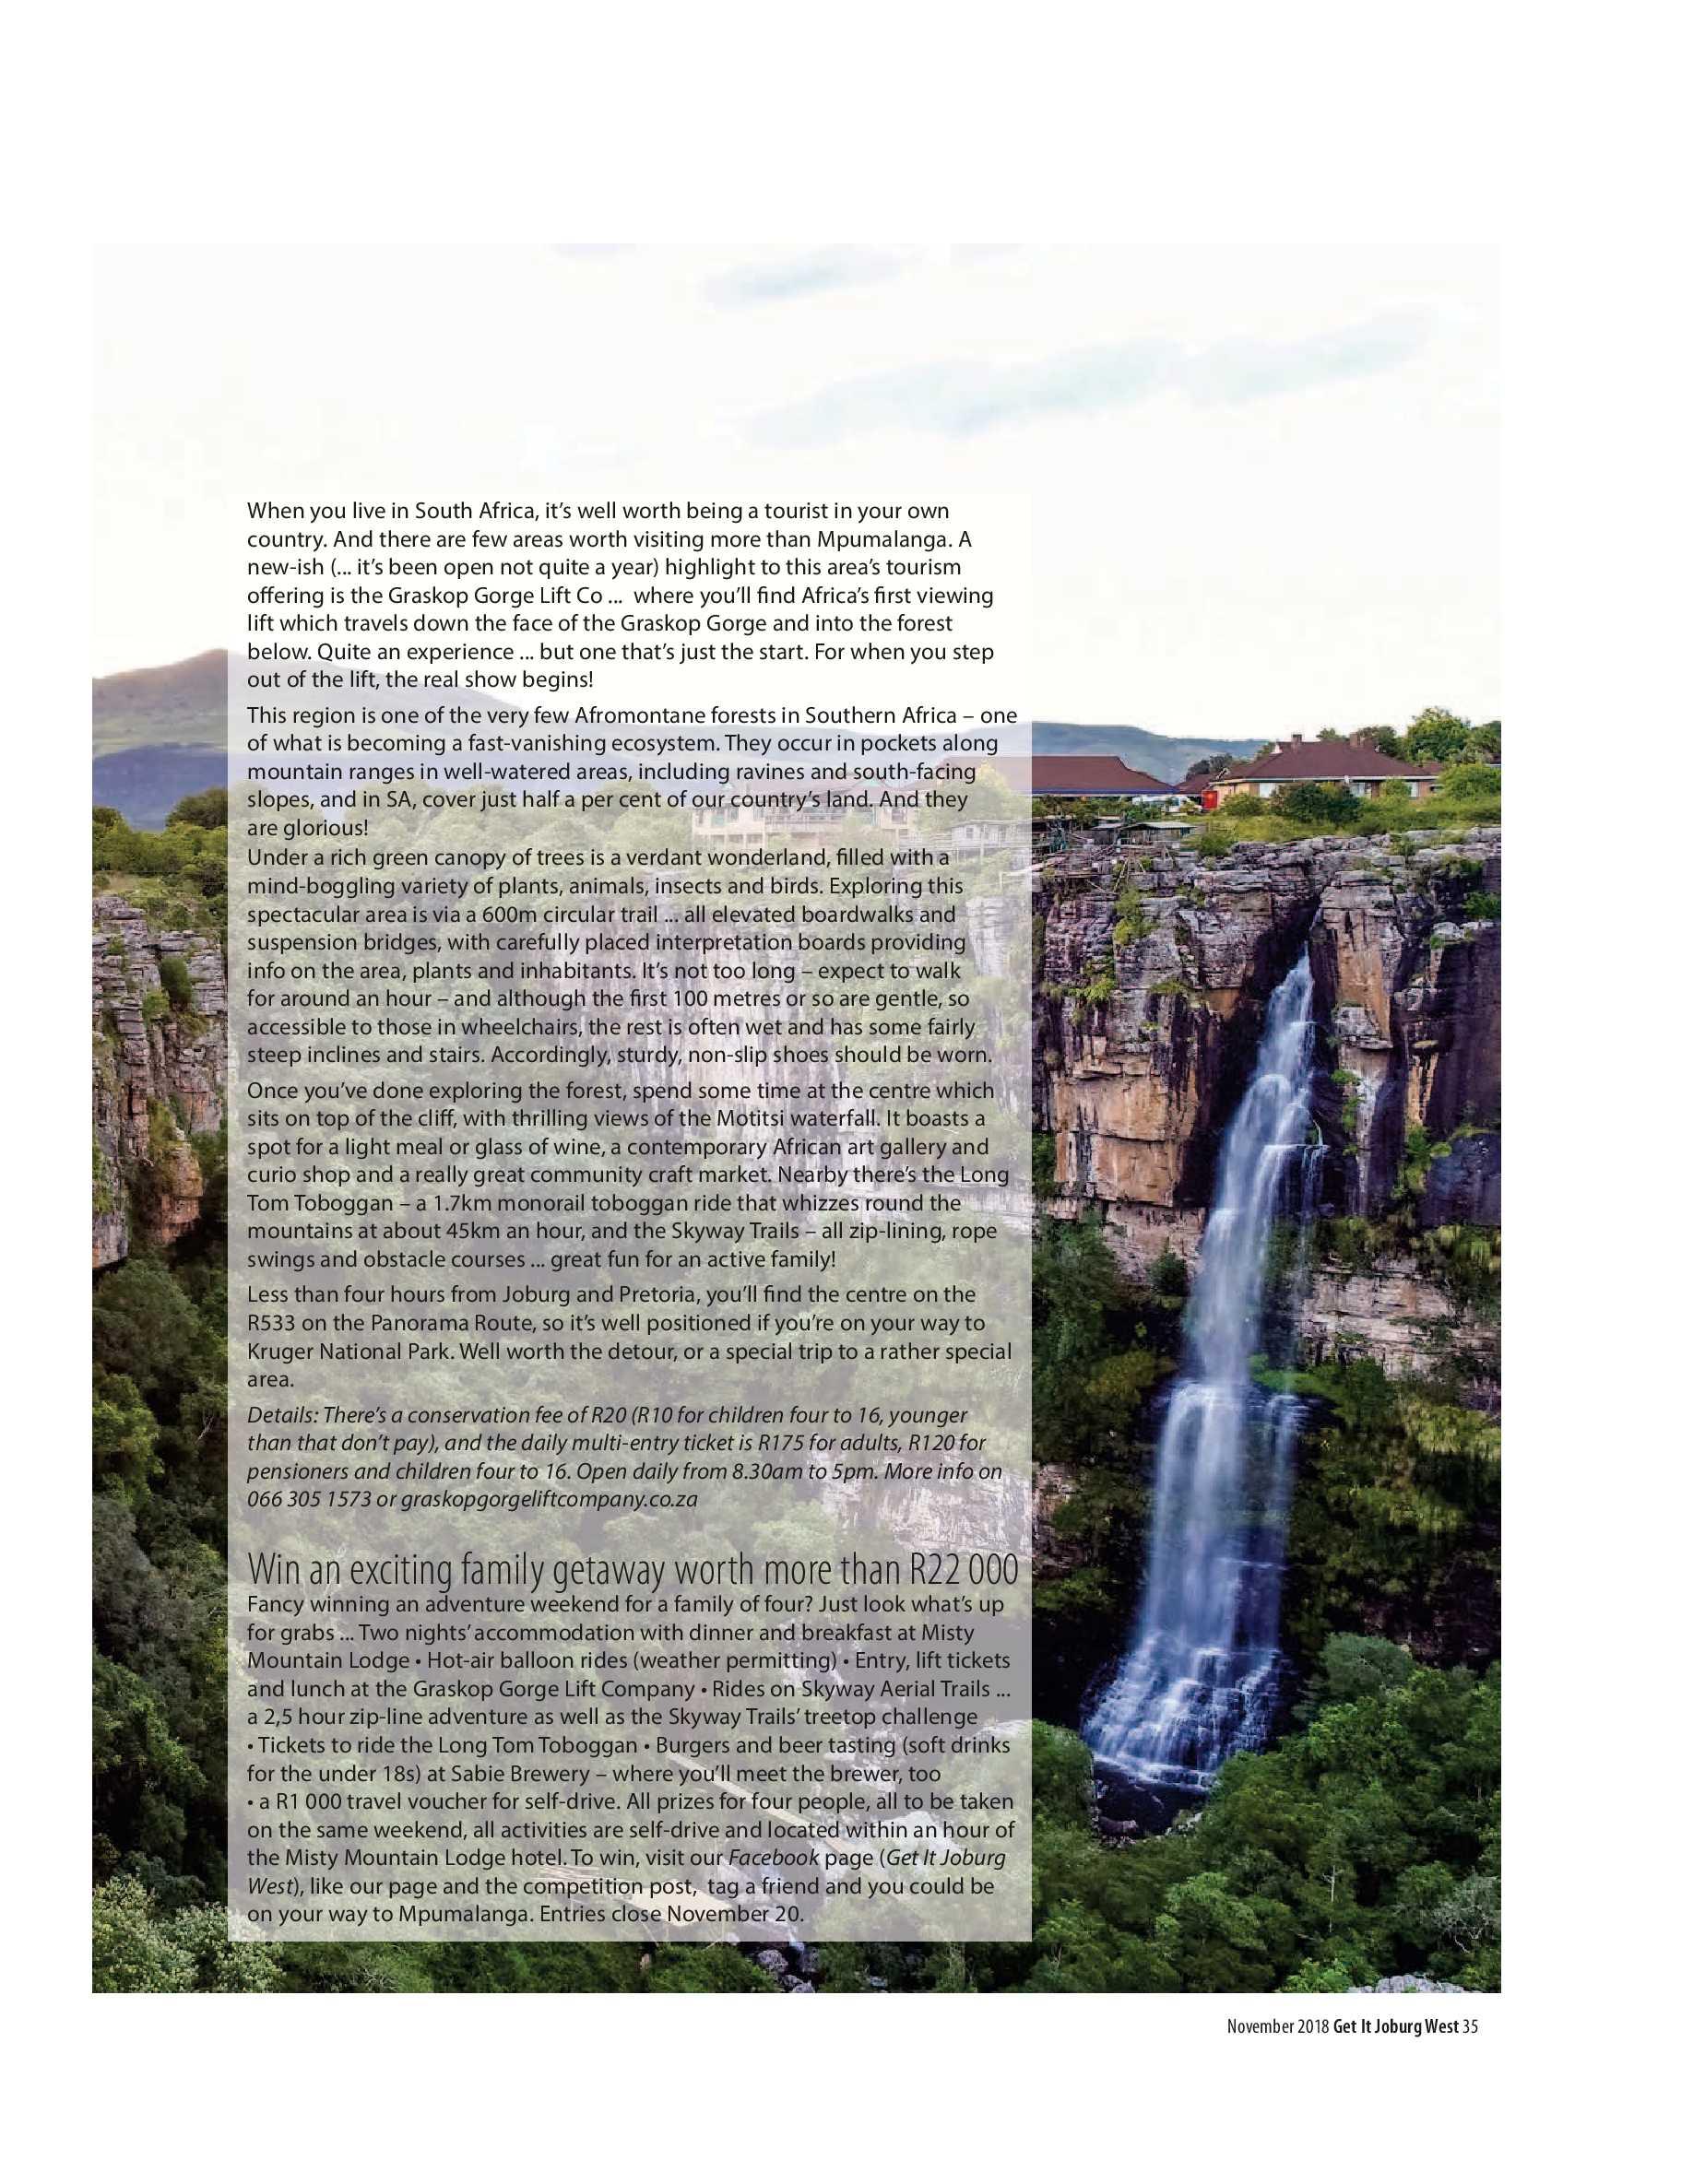 get-joburg-west-november-2018-epapers-page-35